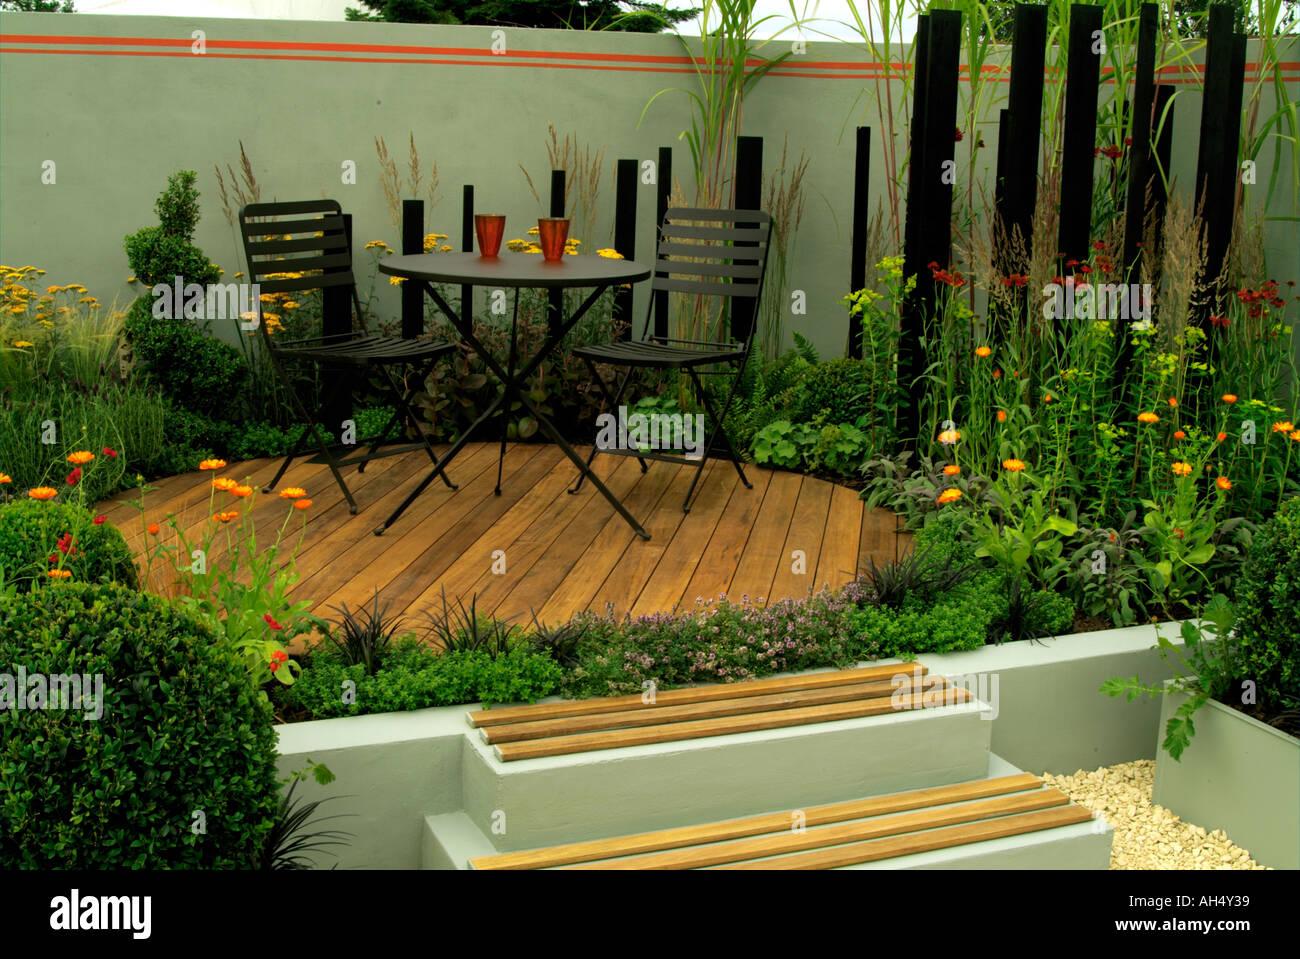 Coin salon de jardin sur terrasse en bois posée dans designer jardin ...